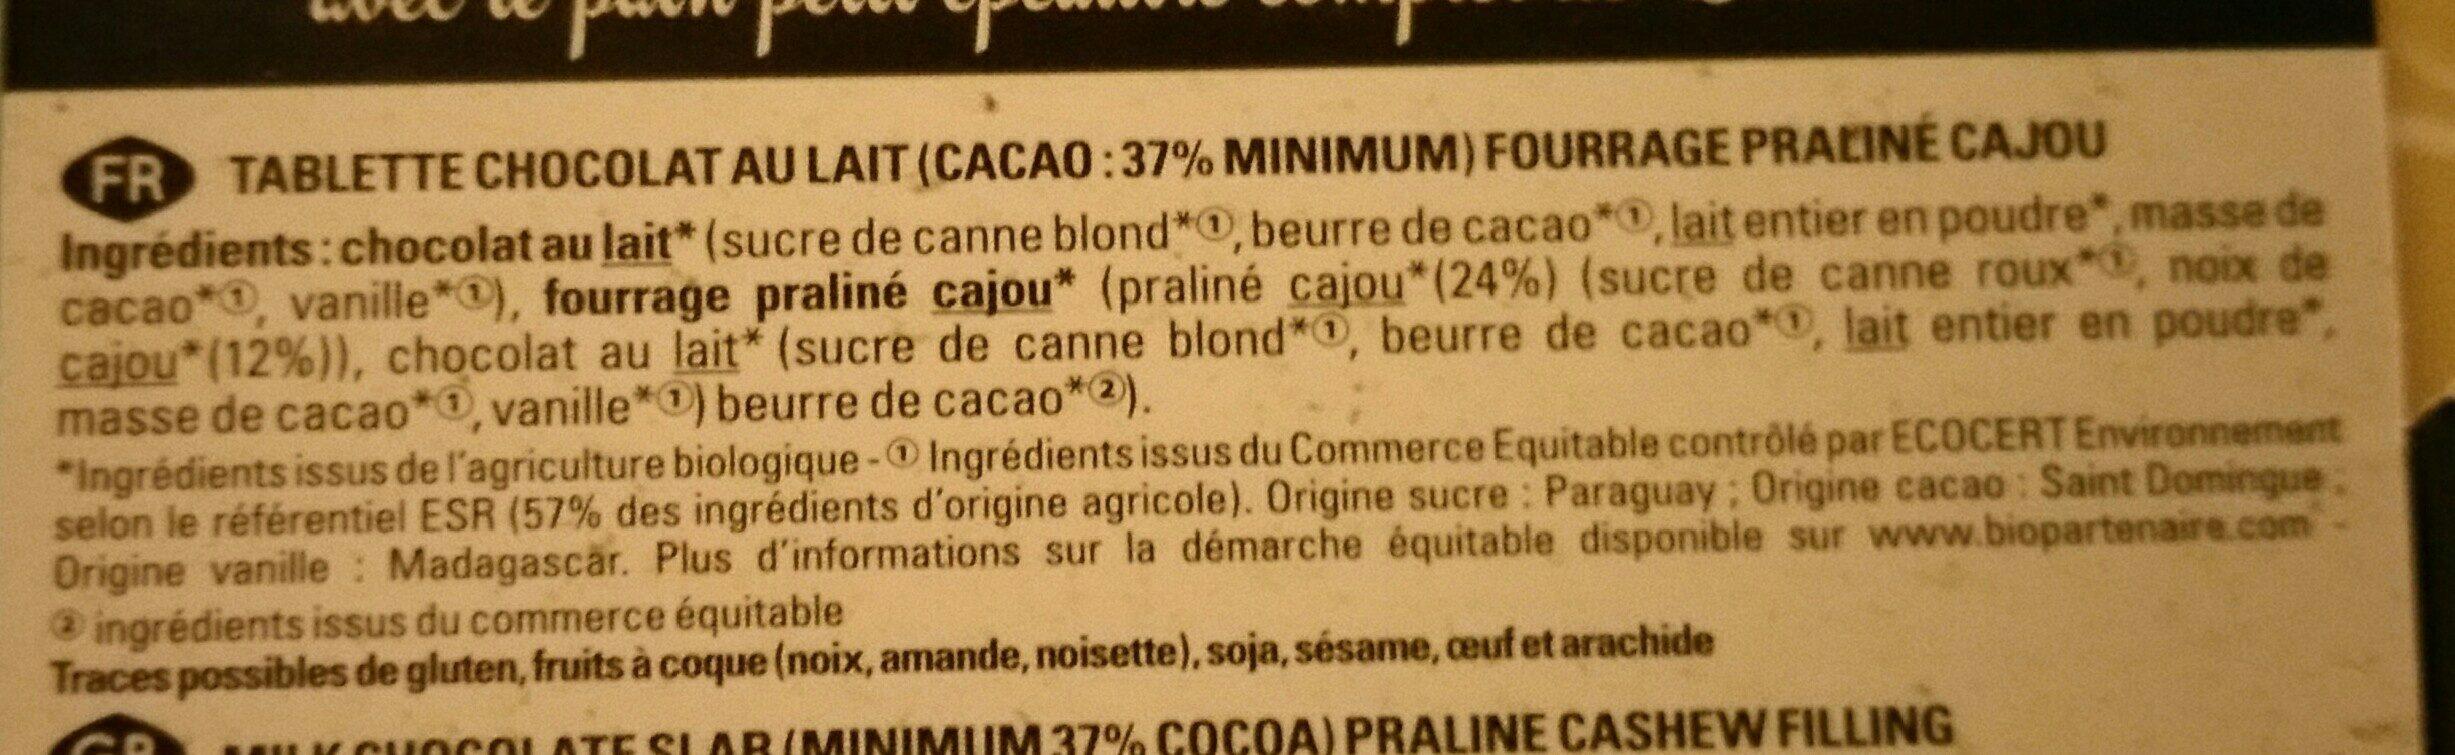 Lait praliné cajou - Ingrediënten